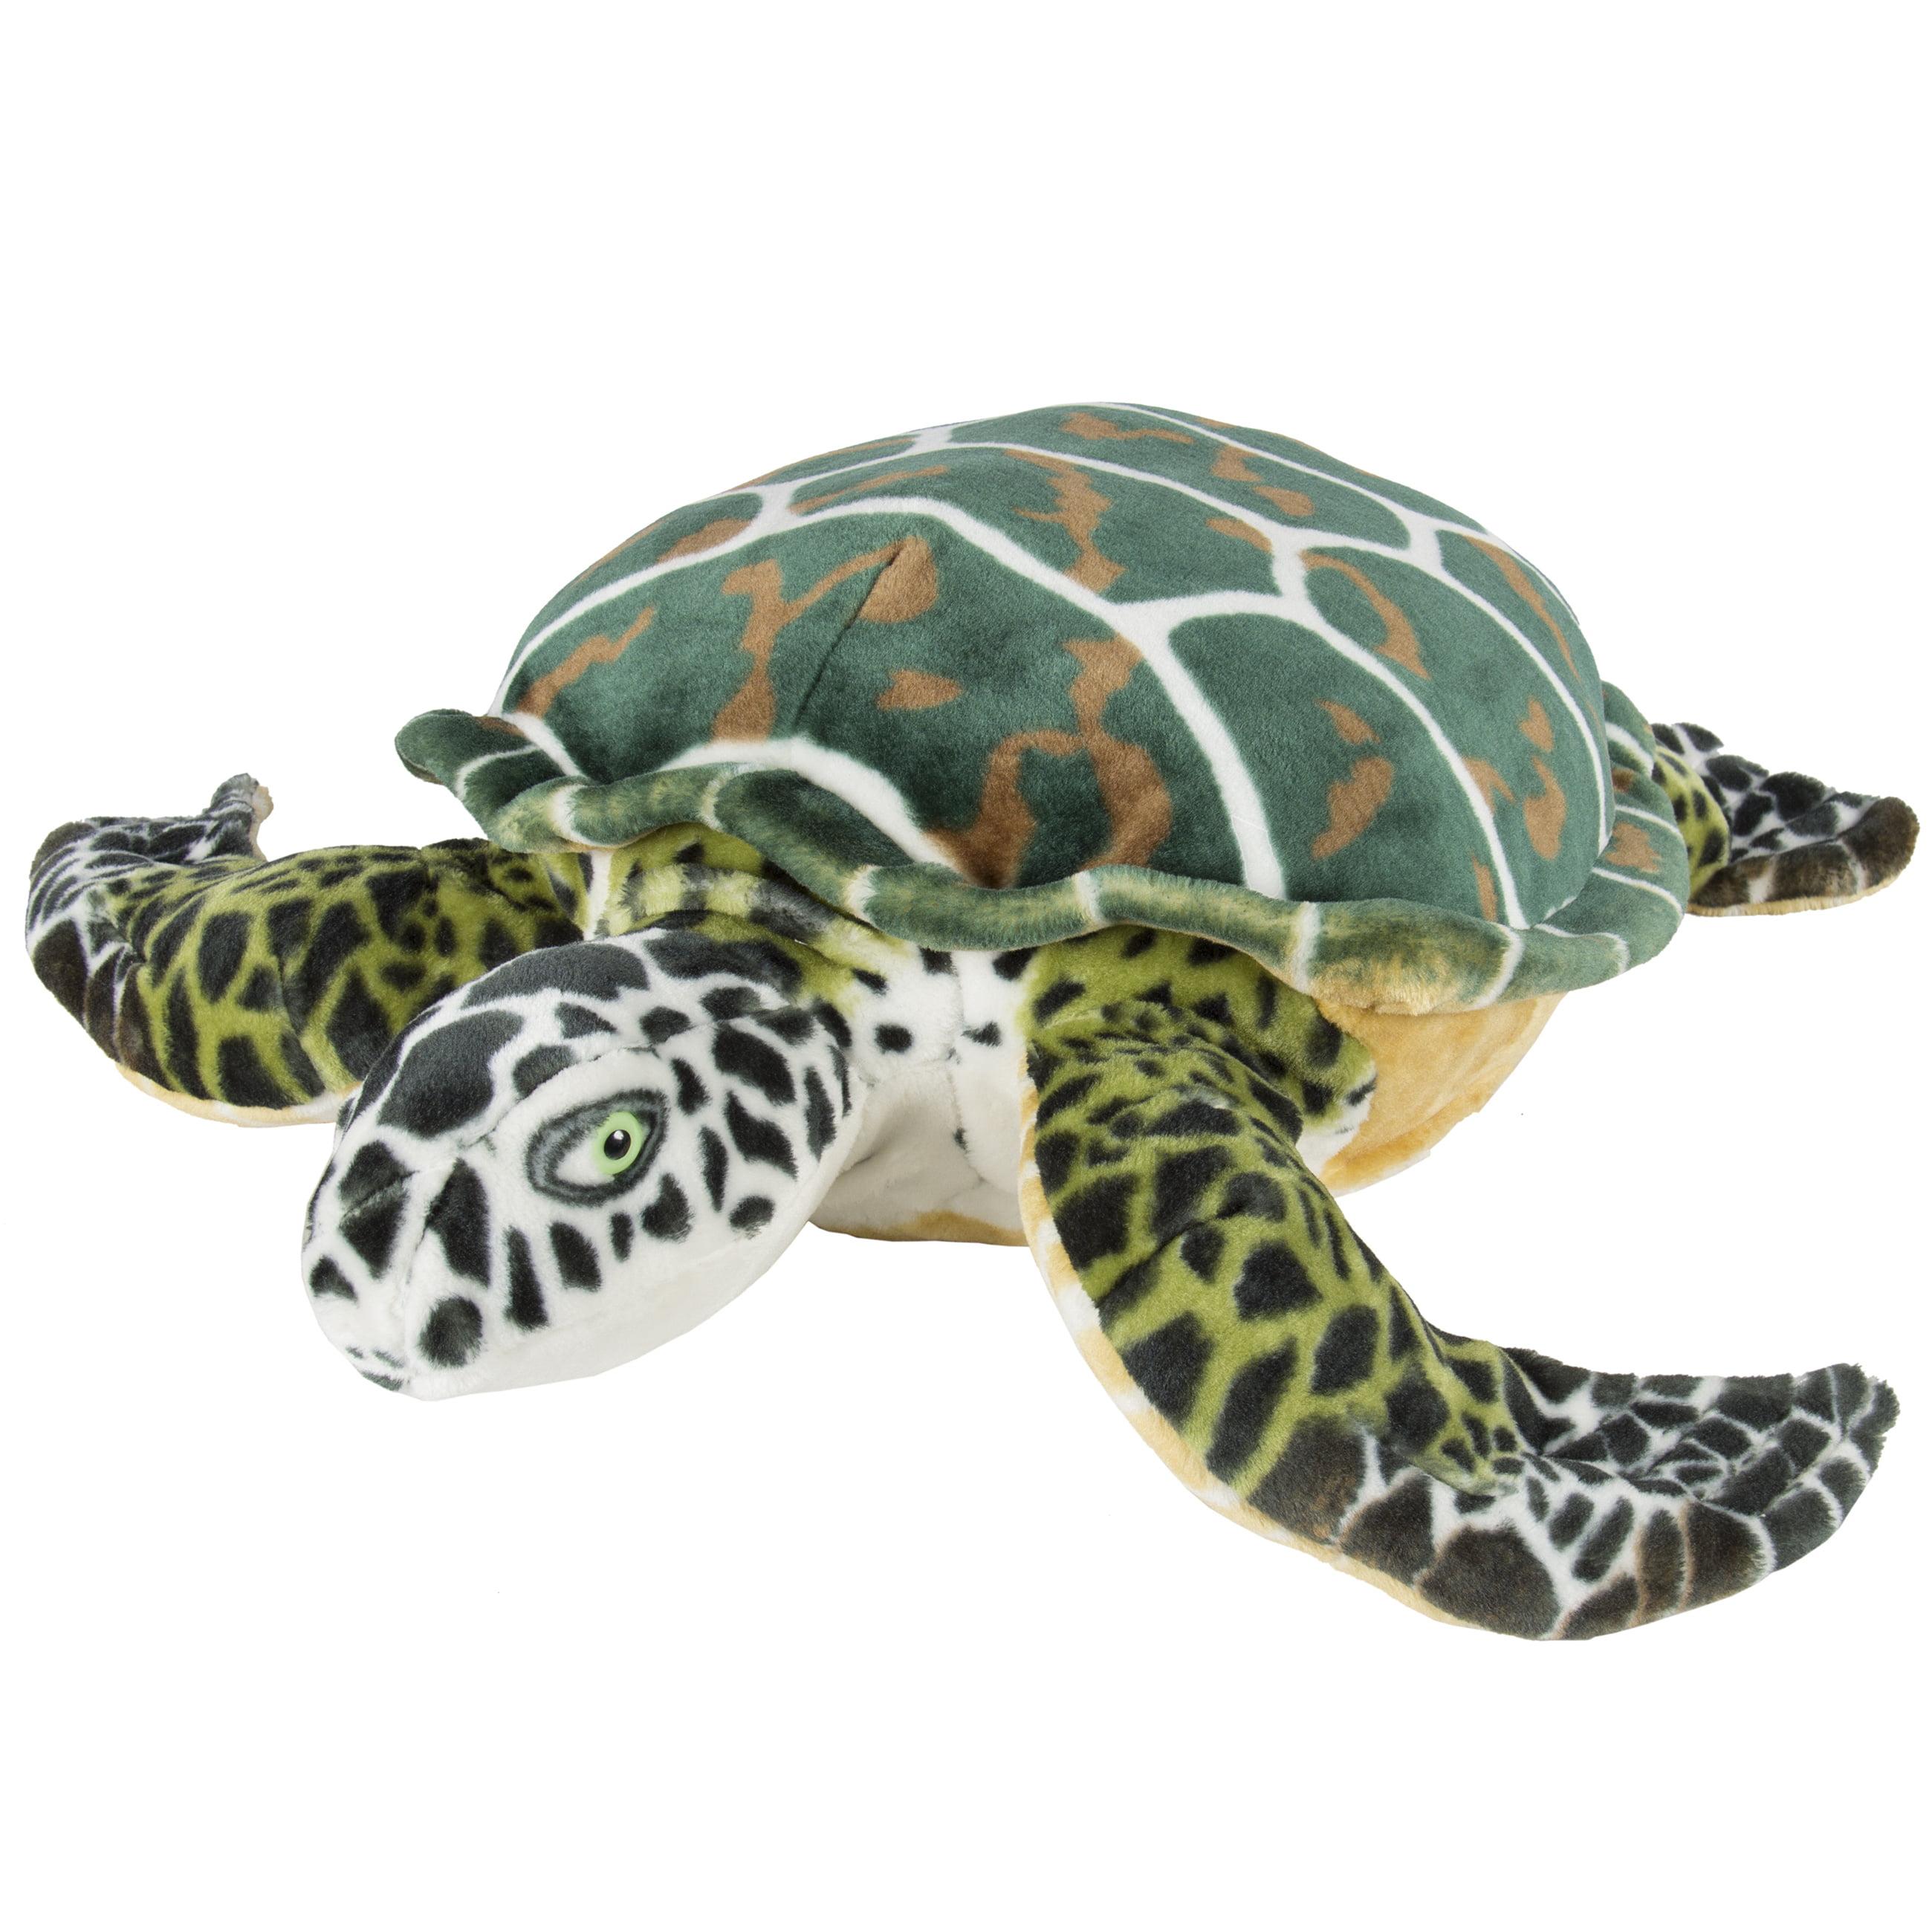 Large Sea Turtle Plush Animal Realistic Tortoise Soft